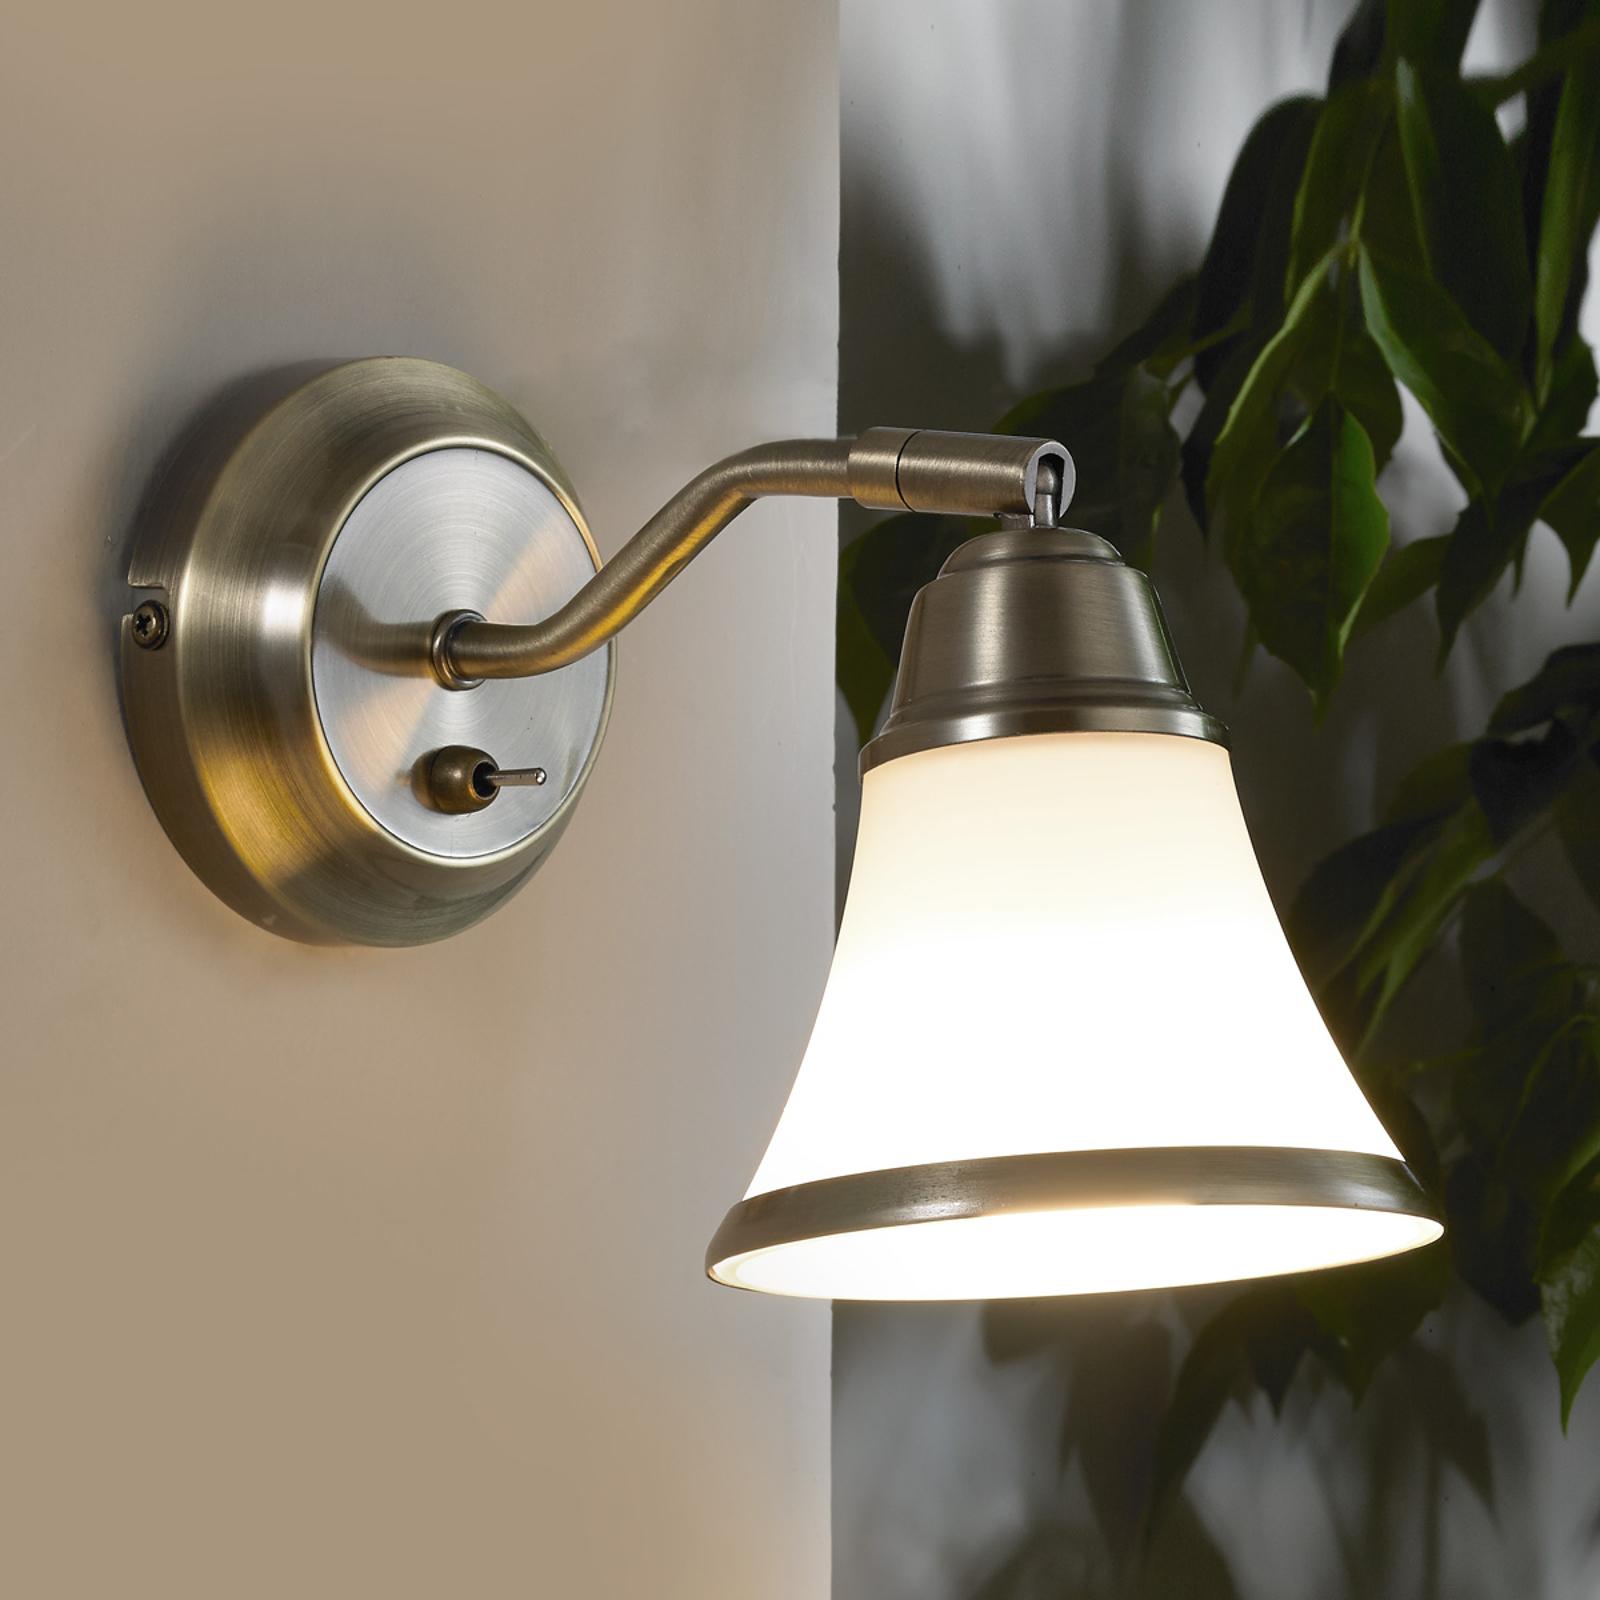 Klassiek aandoende wandlamp Marita